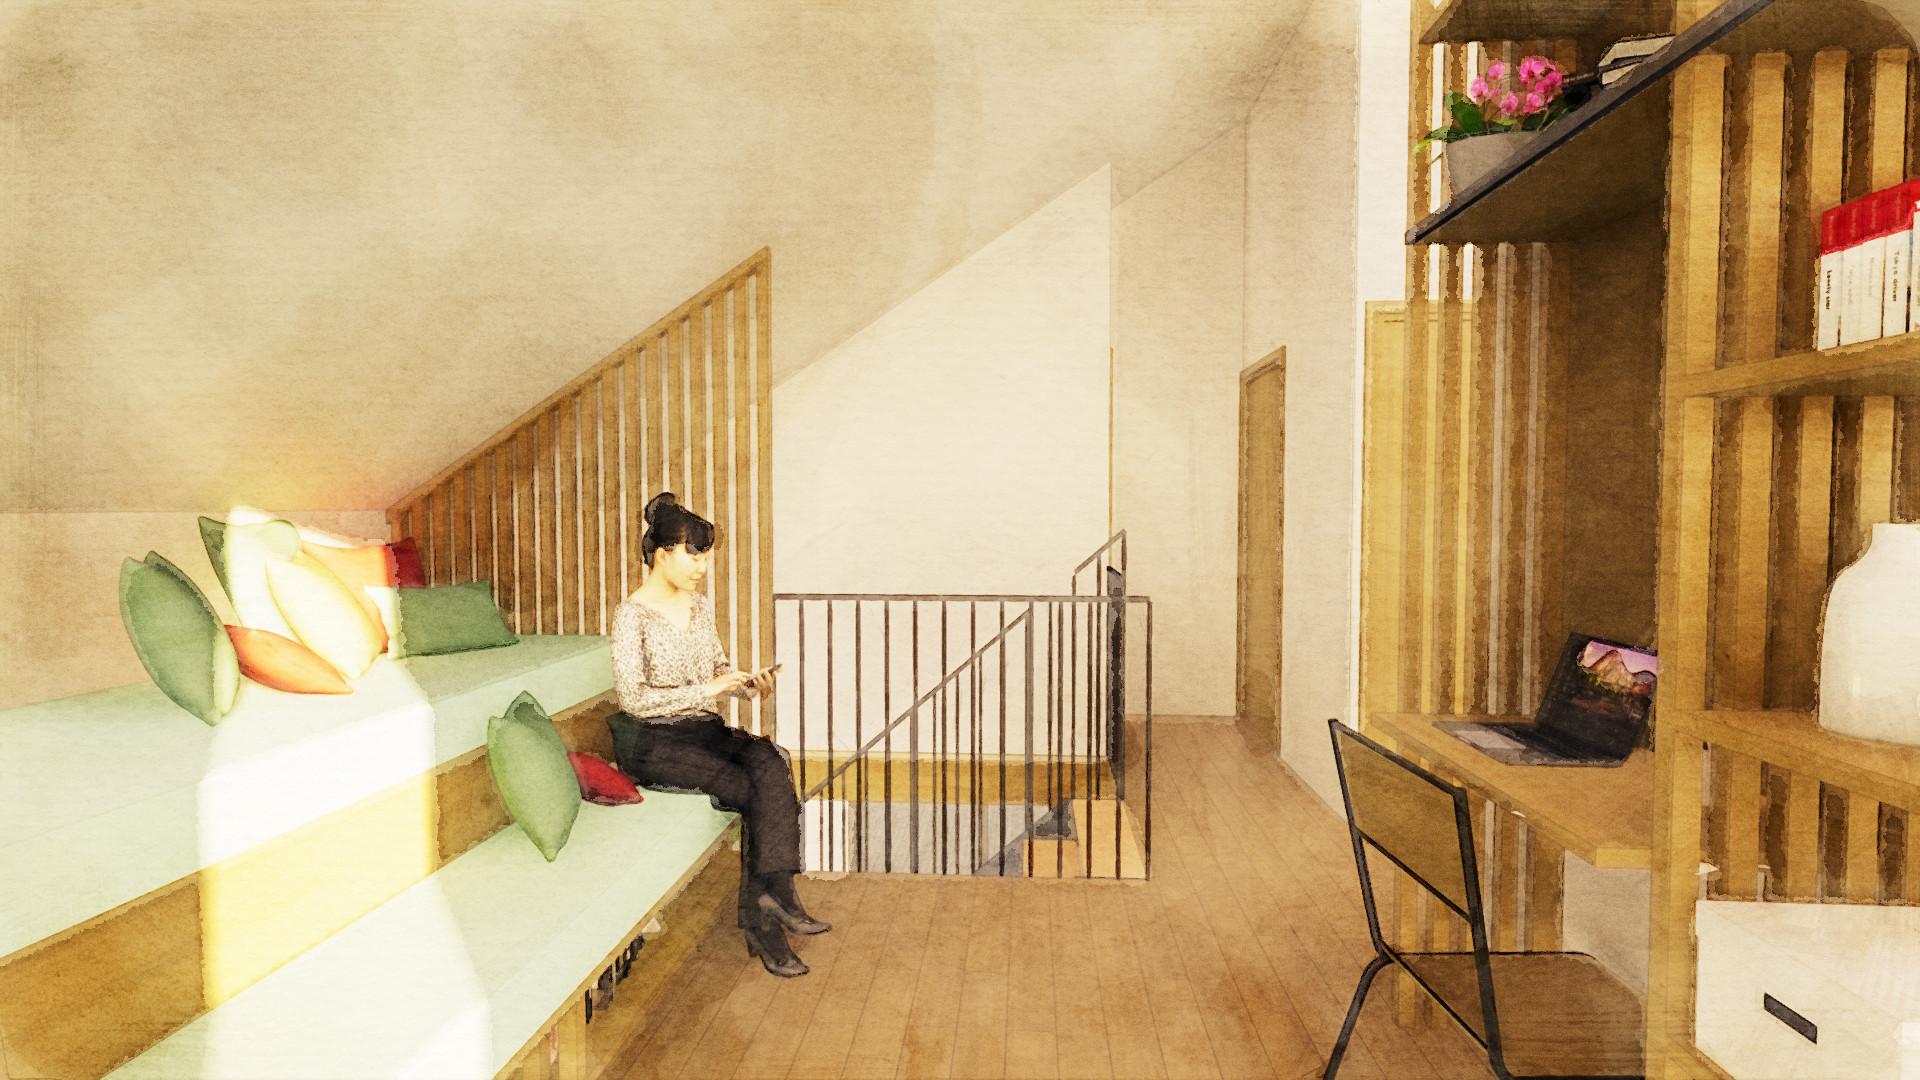 Hirundo-Architecture_Projet B&R_05.jpg